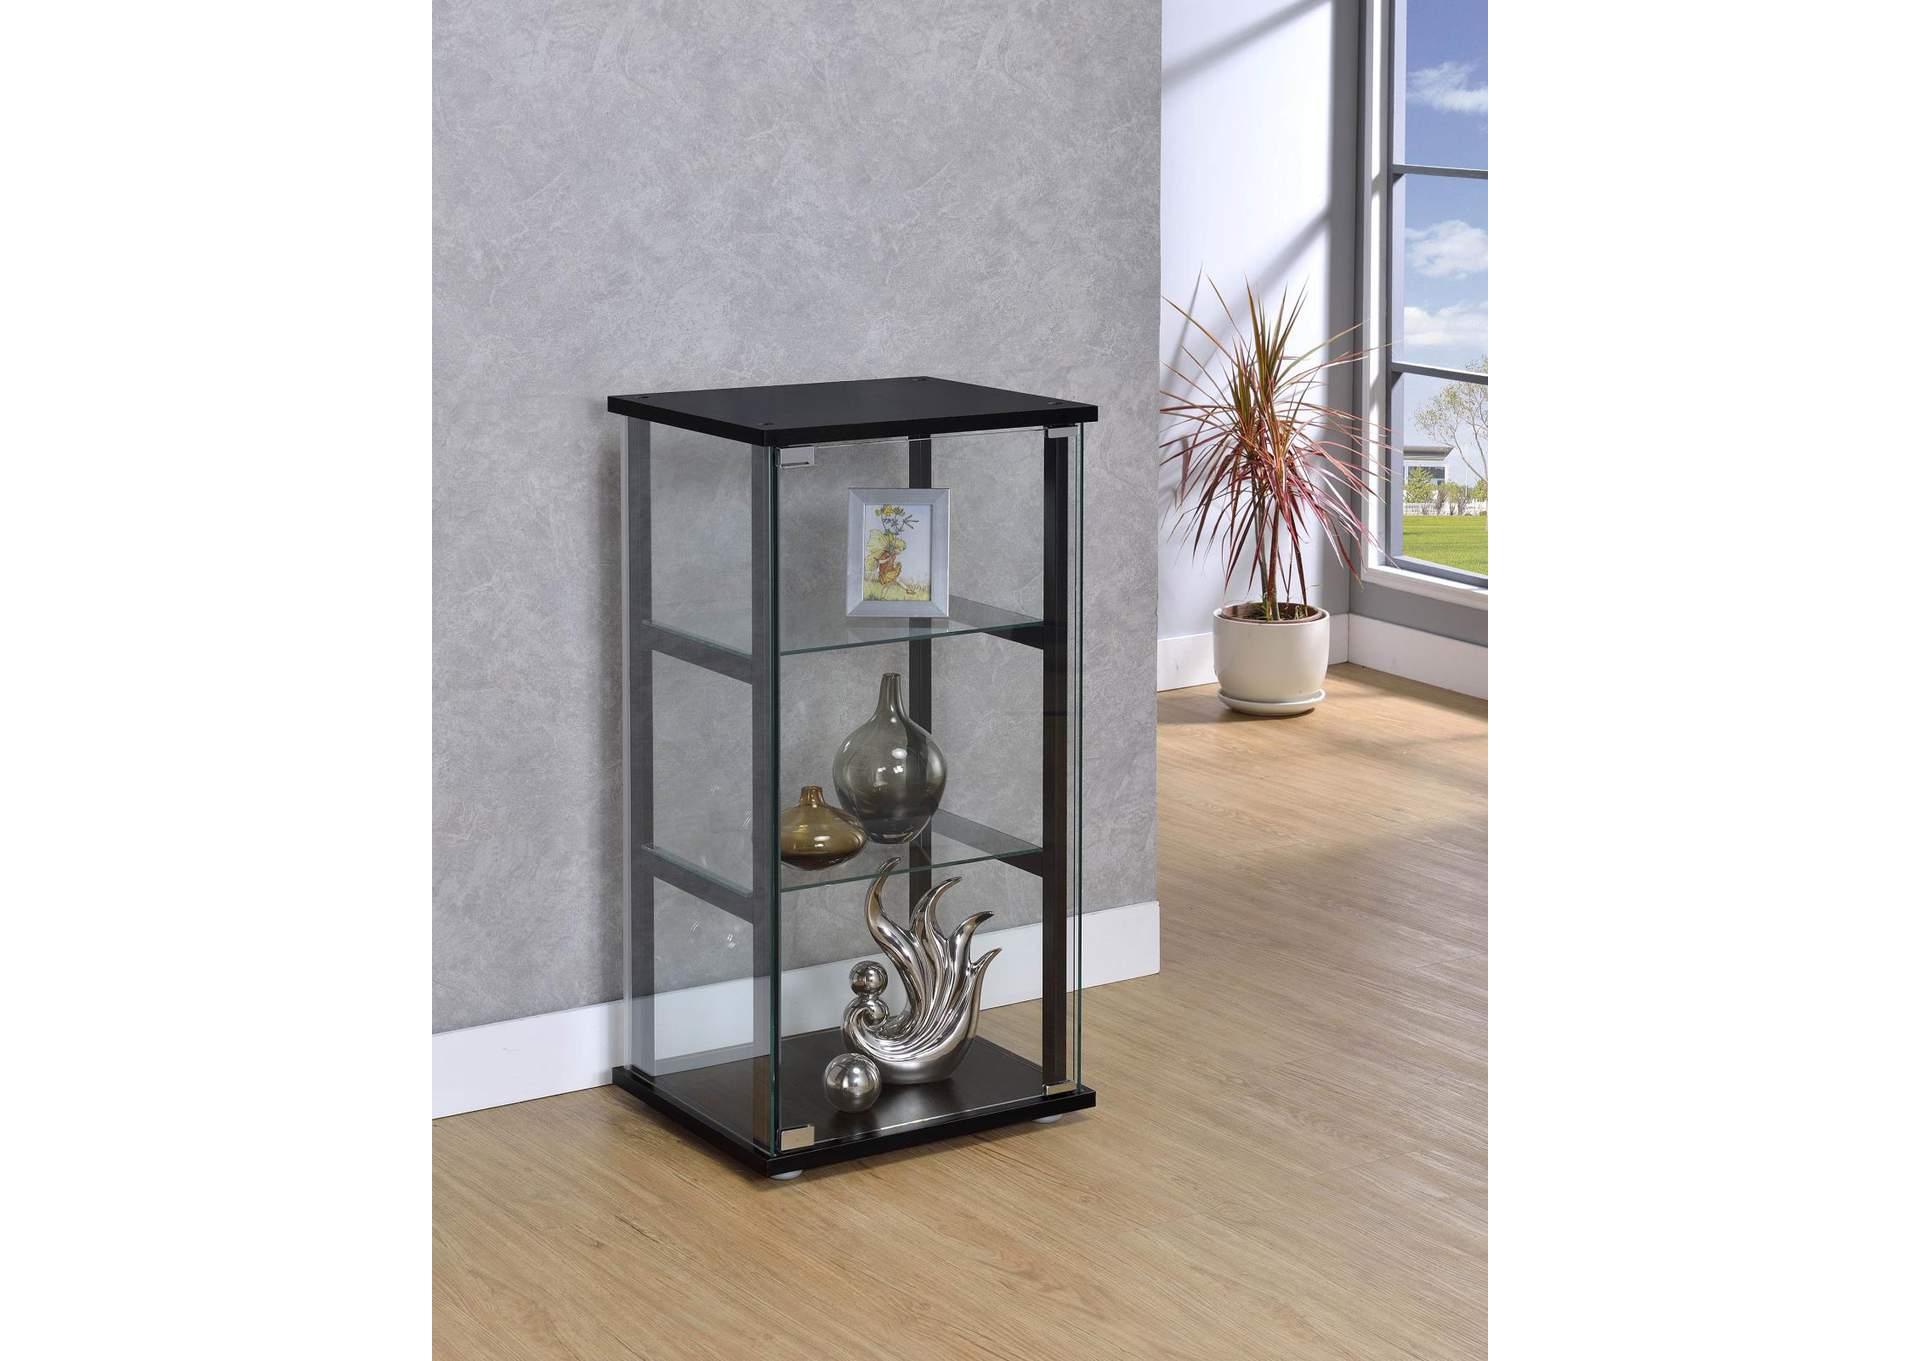 Black Contemporary Black And Glass Curio Cabinet The Furniture Loft